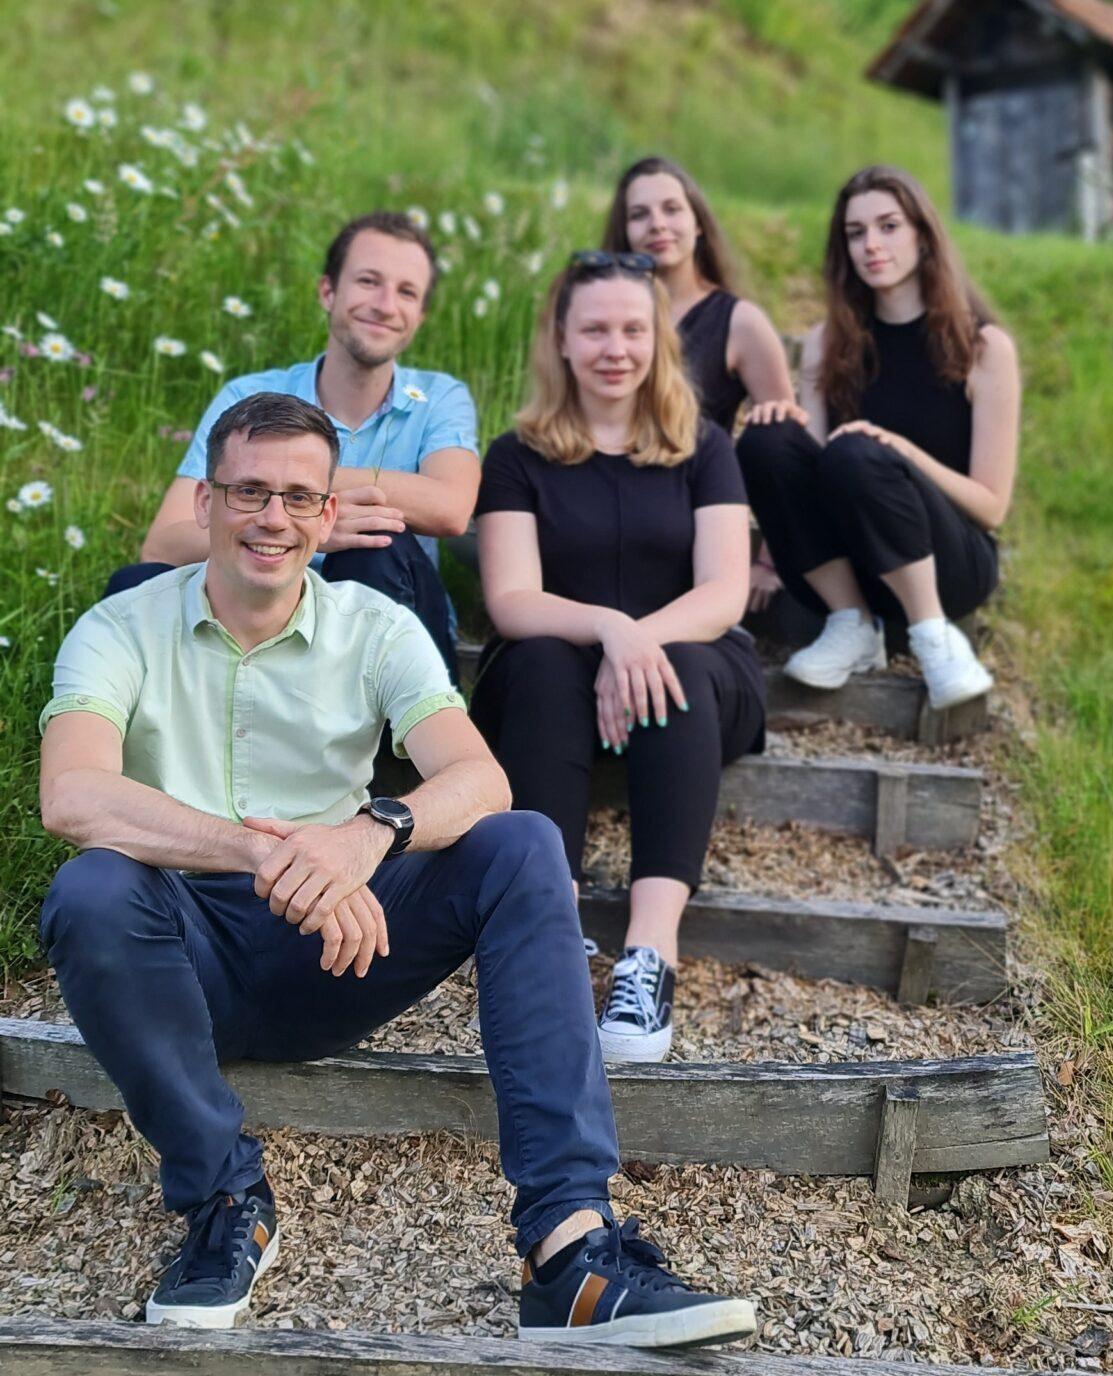 Ekipa 7samurai dosegla 2. mesto na Turističnem start-up vikendu v Termah Snovik